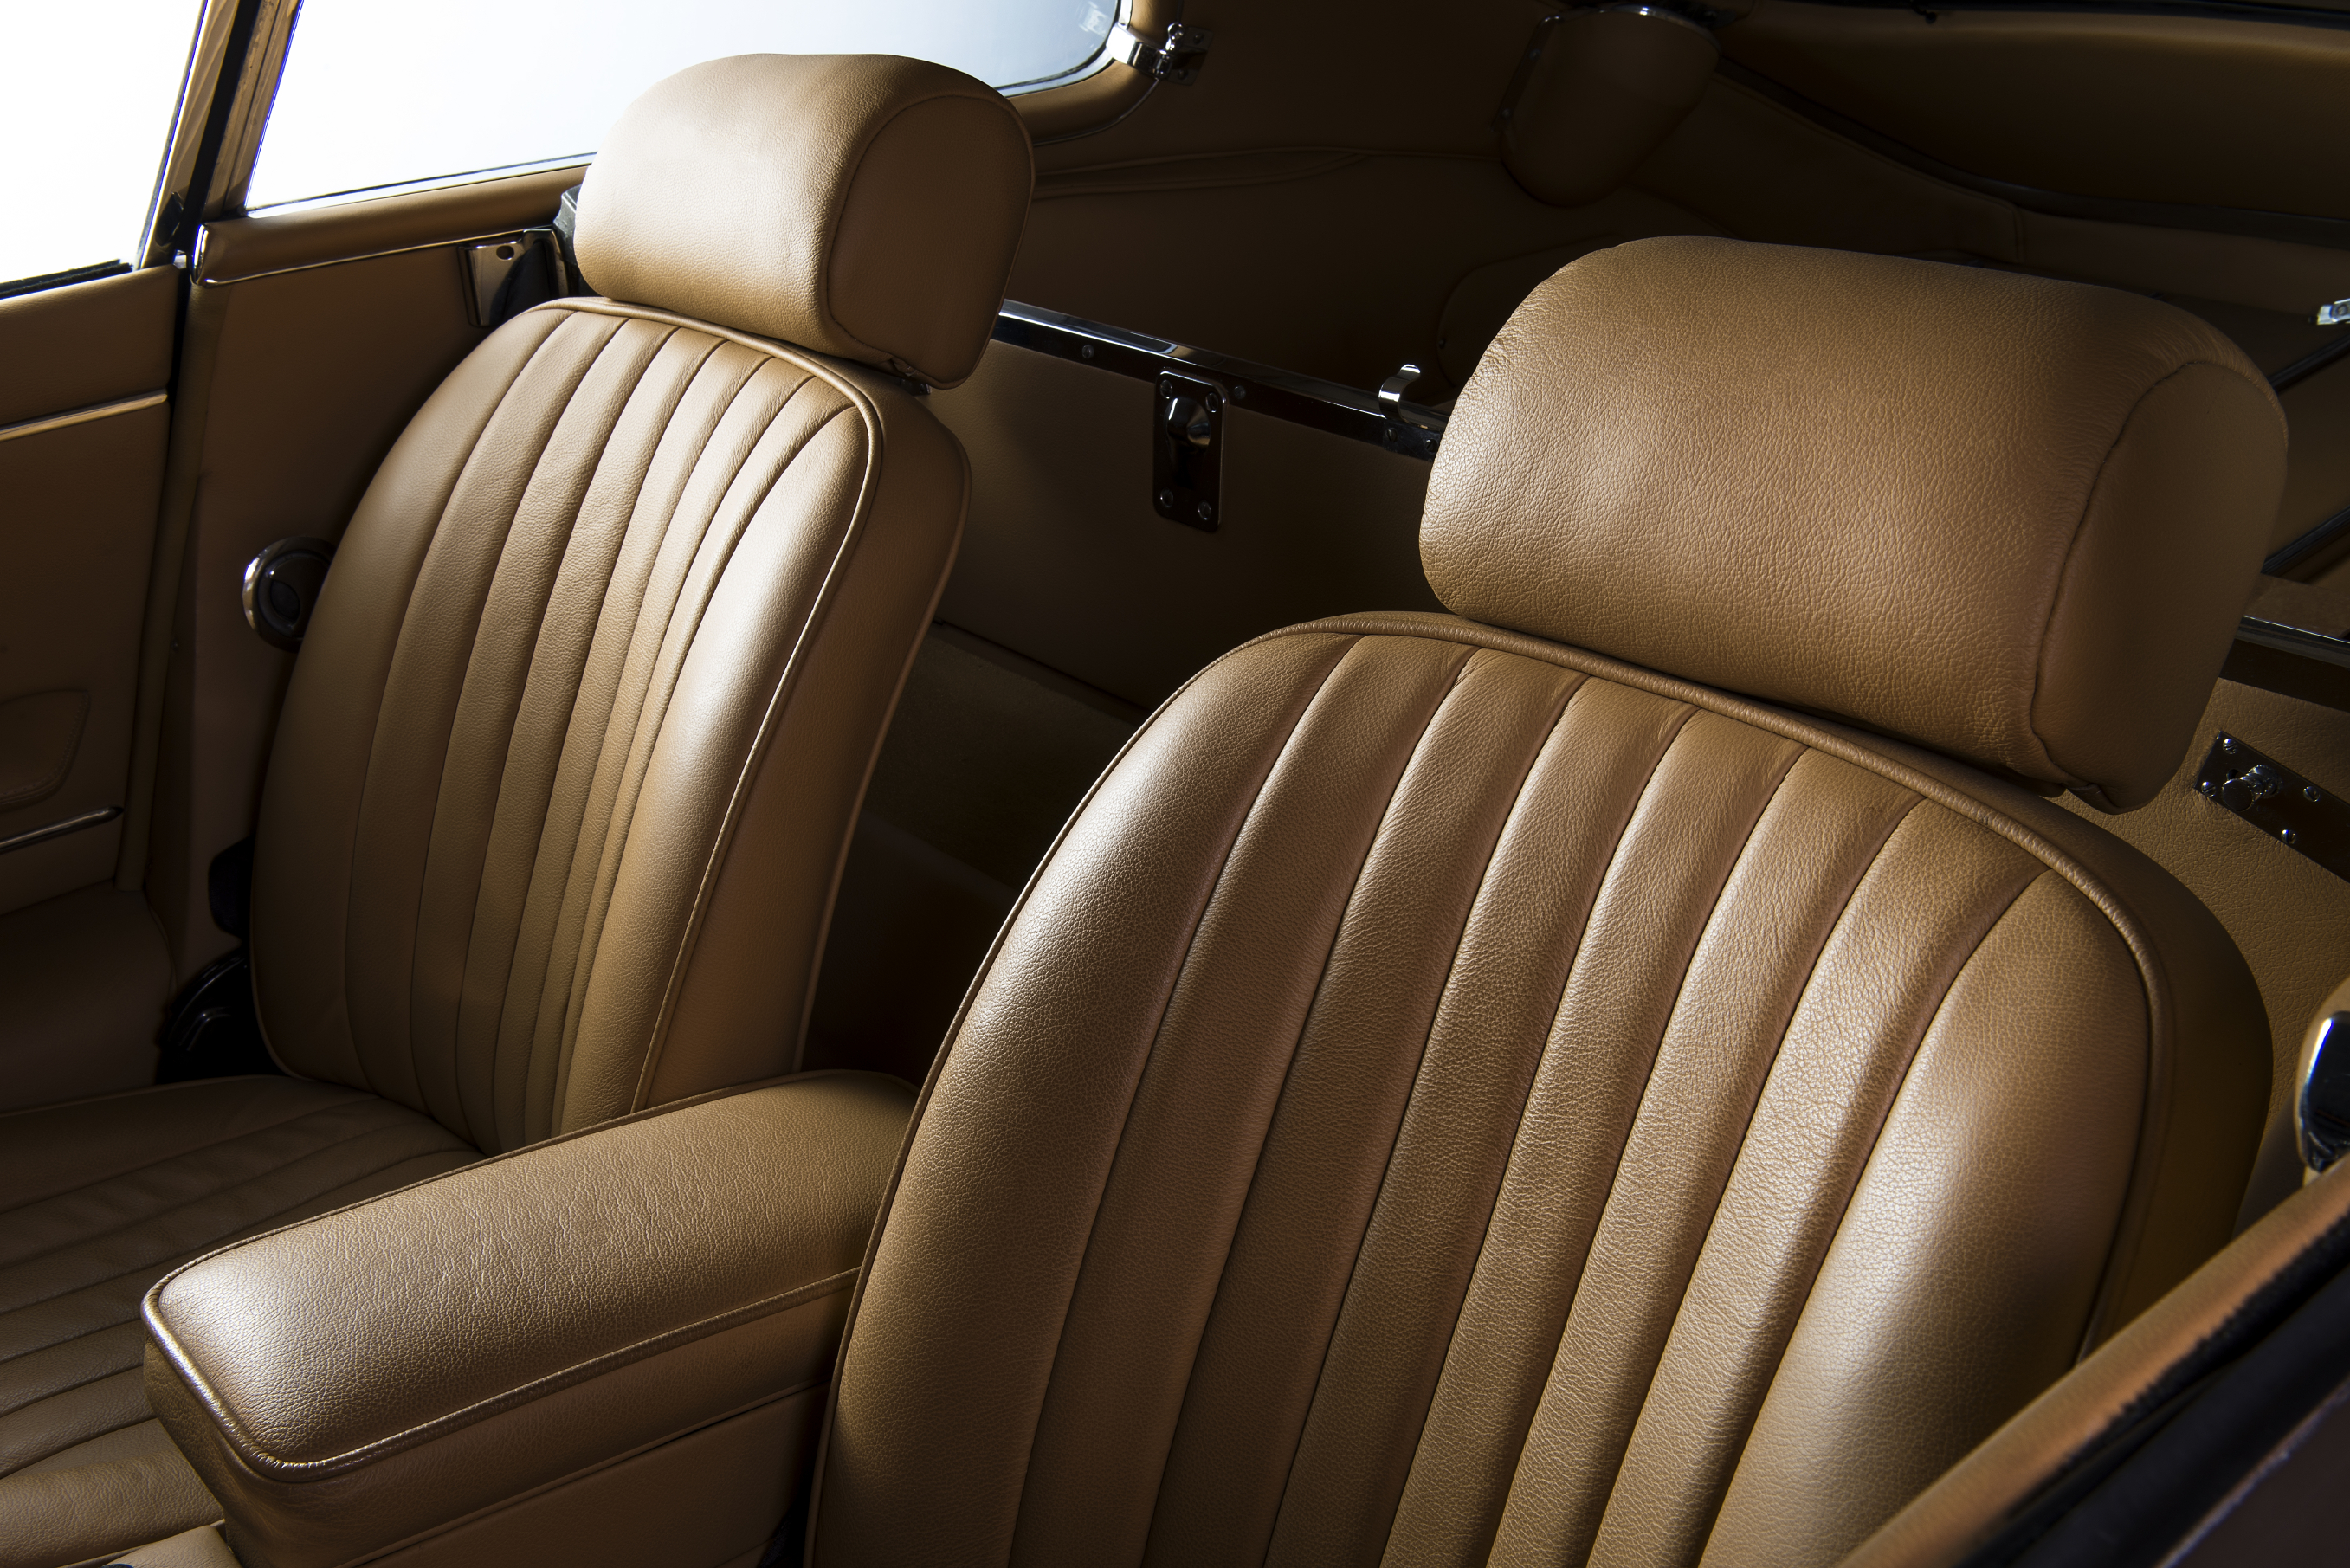 Interieur auto reinigen ontgeuren of herstellen bij dp for Auto interieur reinigen